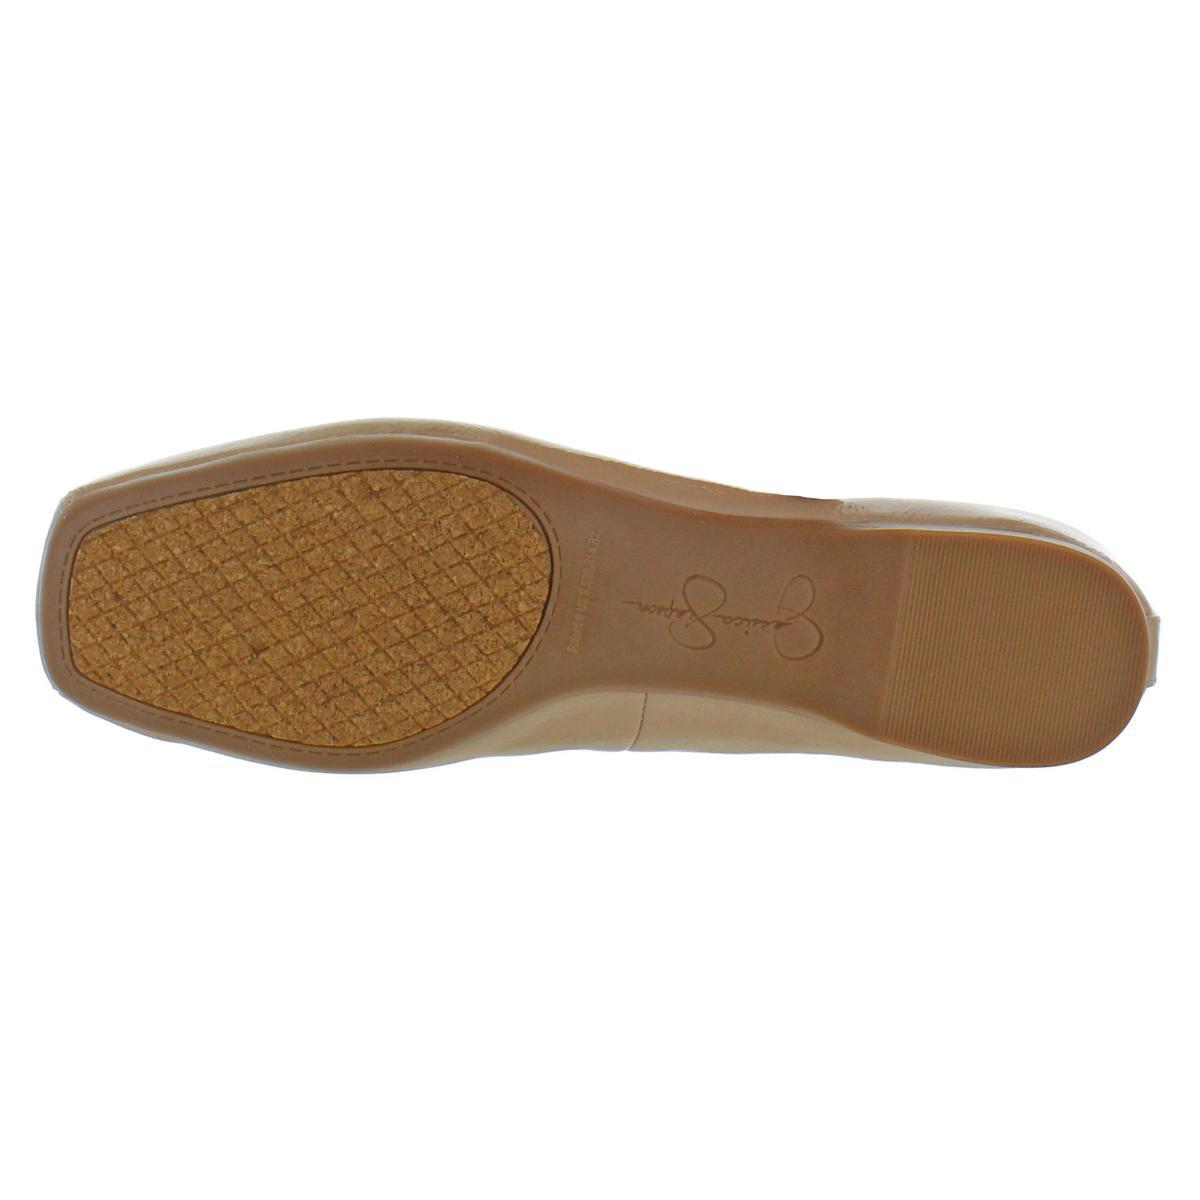 Jessica-Simpson-Women-039-s-Mandalaye-Square-Toe-Ankle-Wrap-Ballet-Flats thumbnail 19